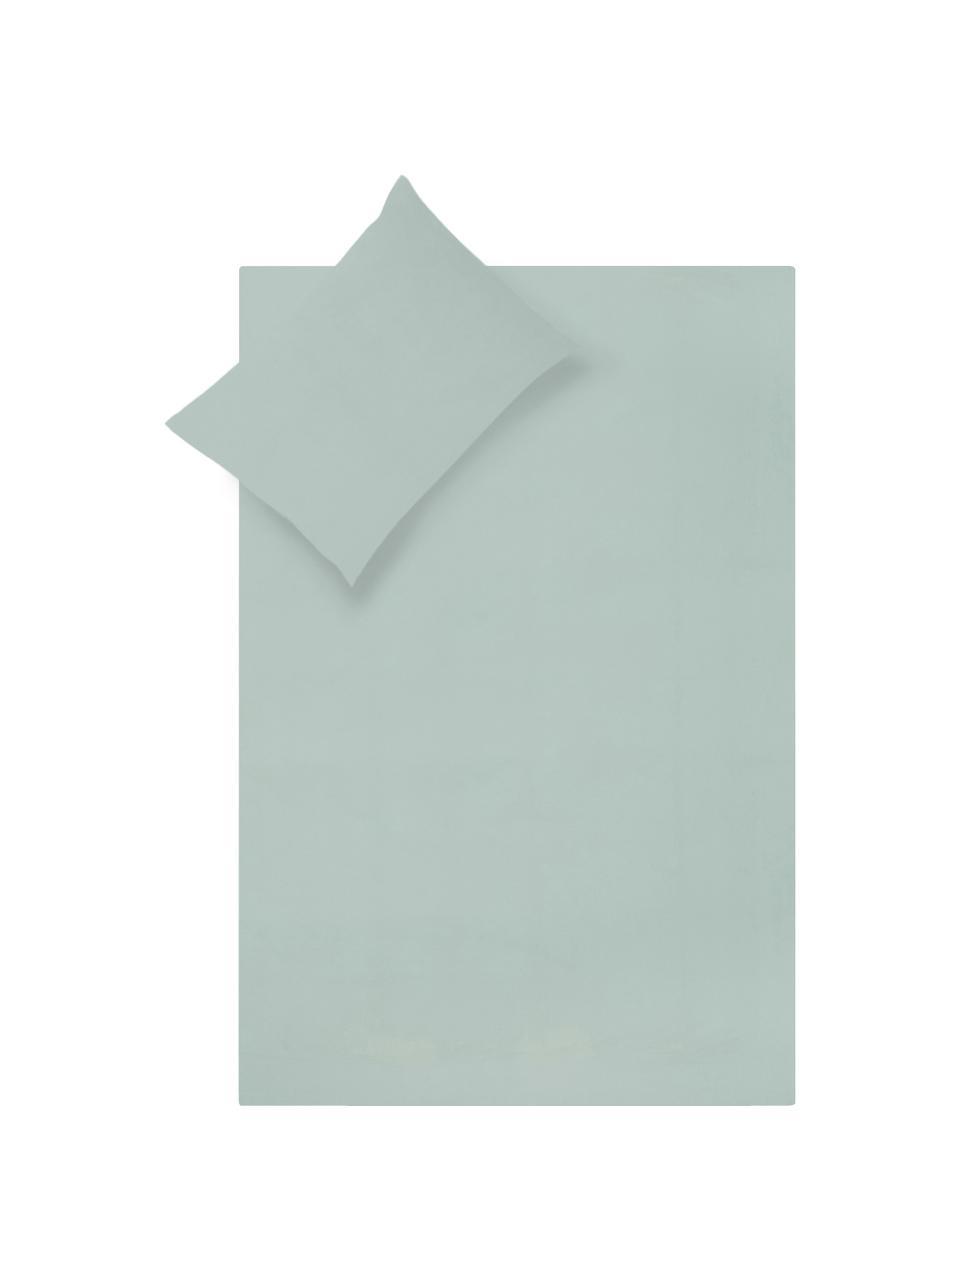 Set lenzuola in cotone percalle verde salvia Elsie, Verde salvia, 240 x 300 cm + 2 cuscini 50 x 80 cm